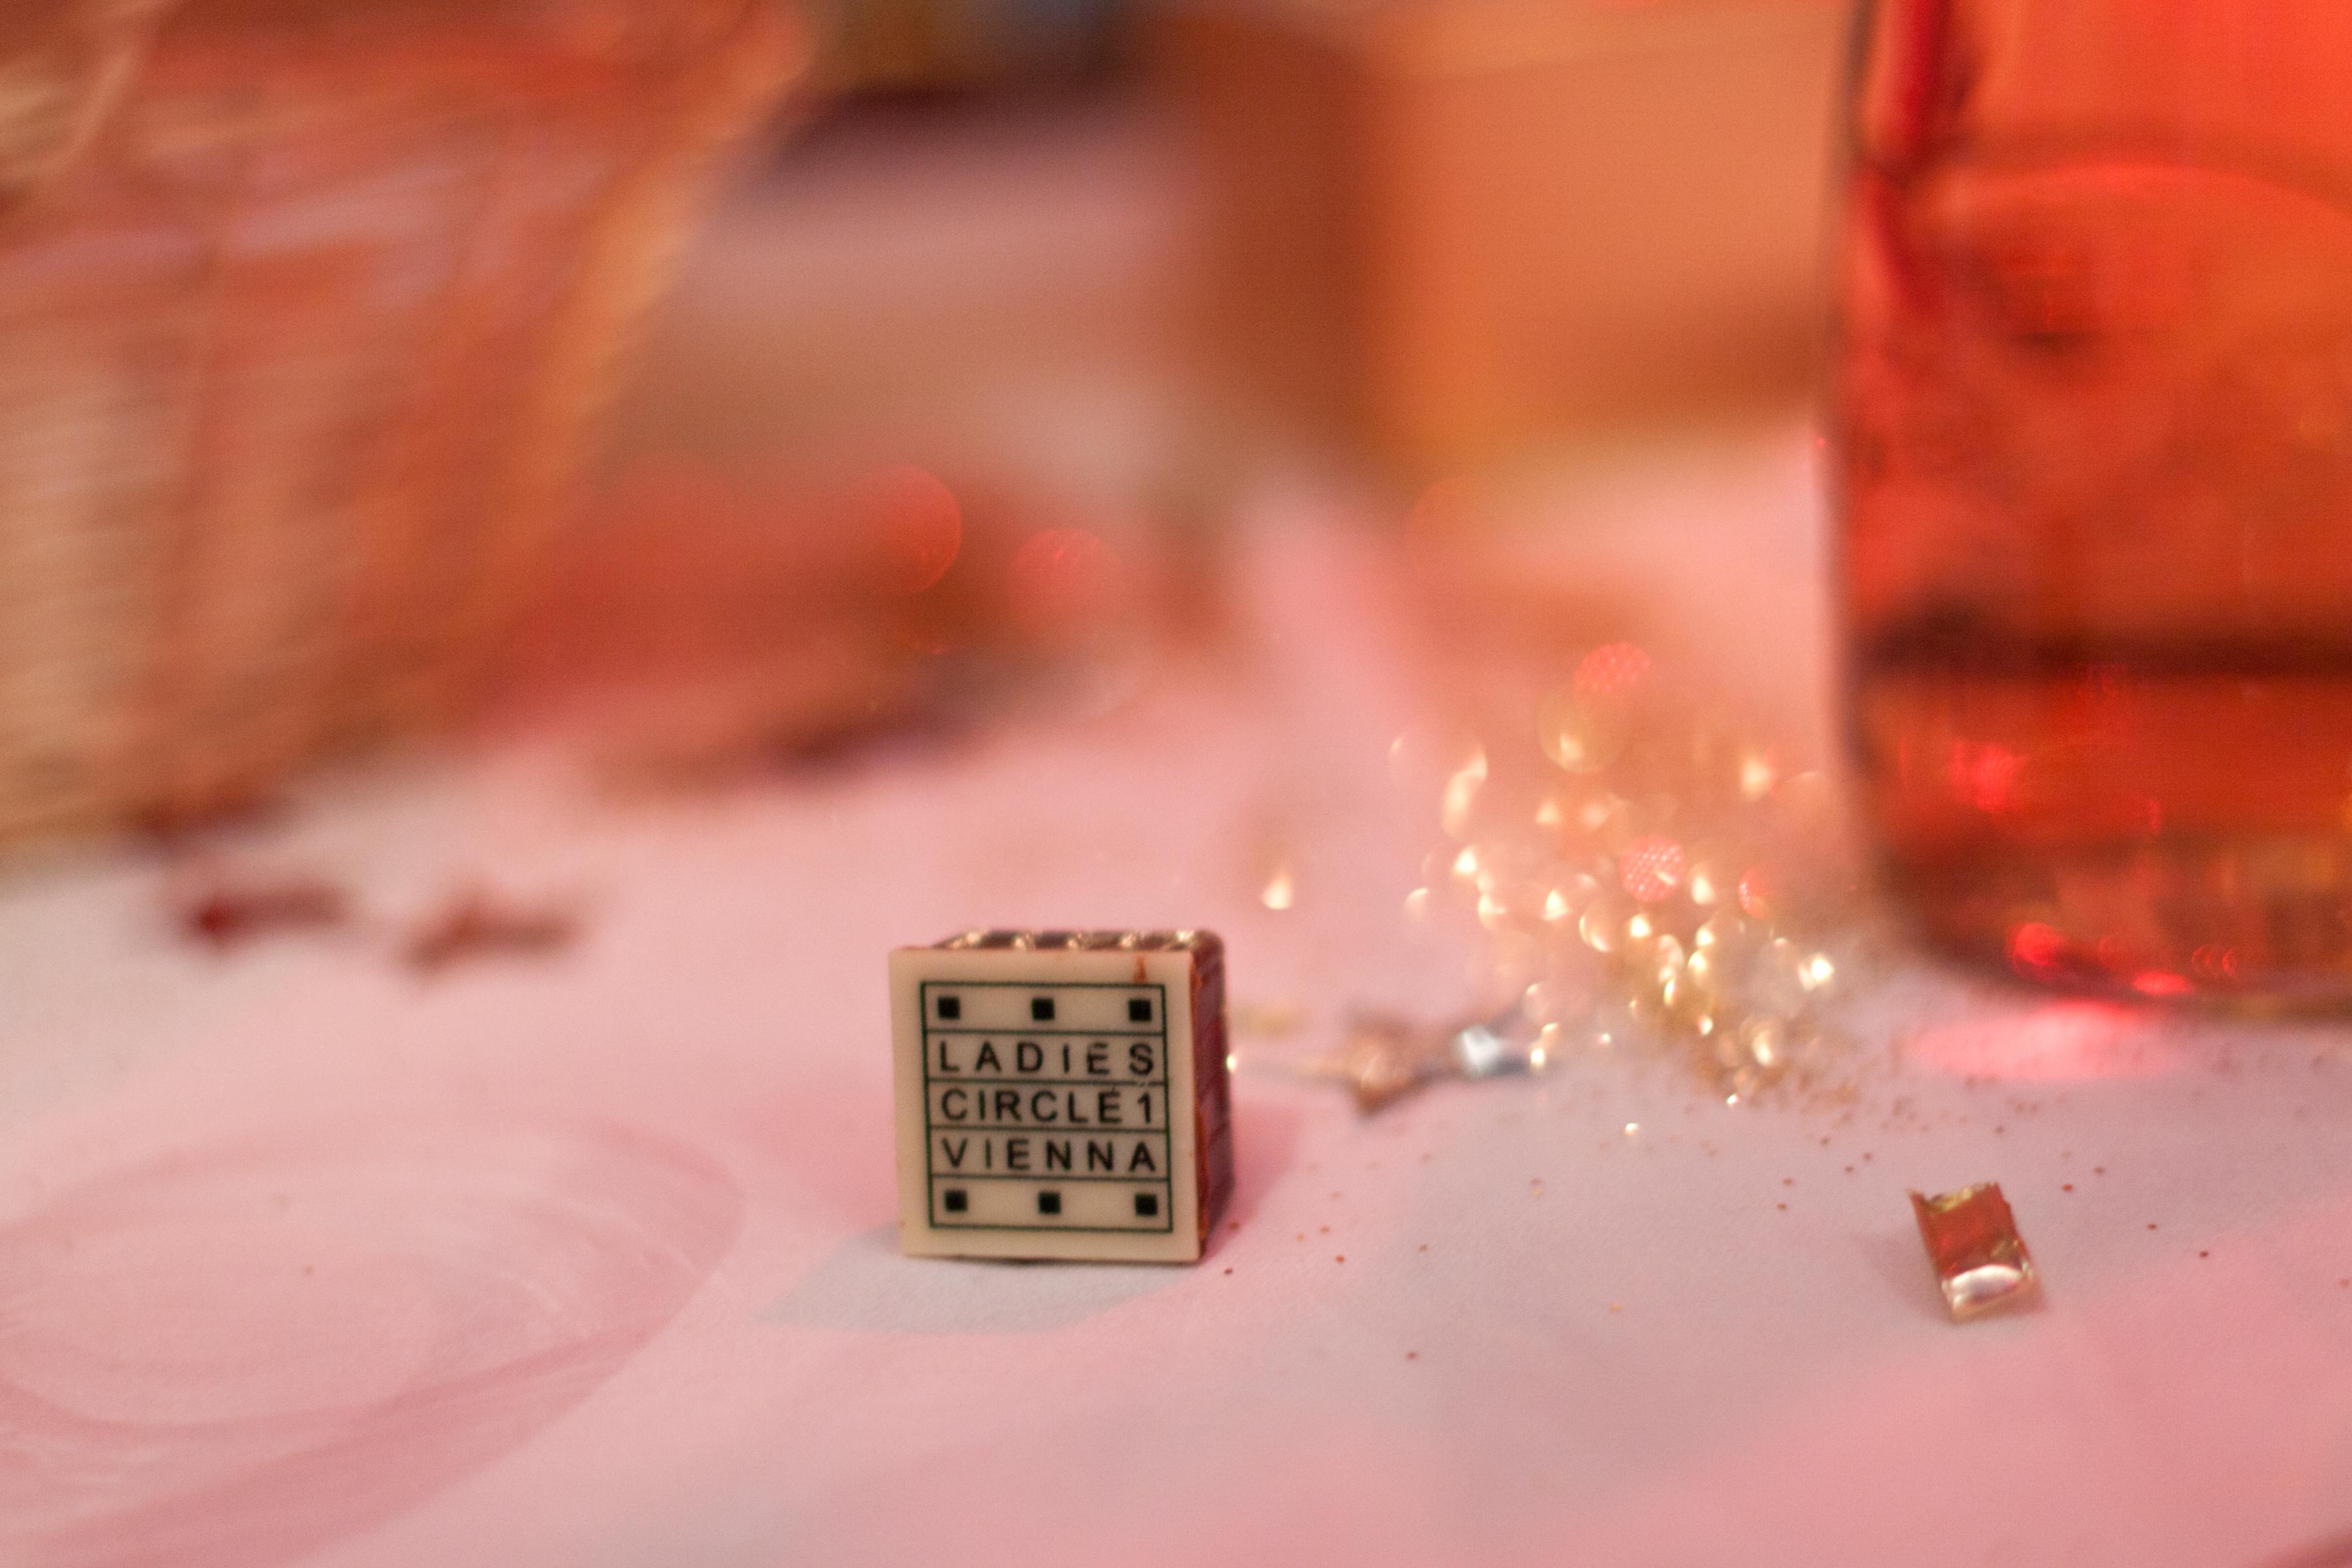 HJV 2016_Gala Abend LC1 Konfekt von Dodo Kucher